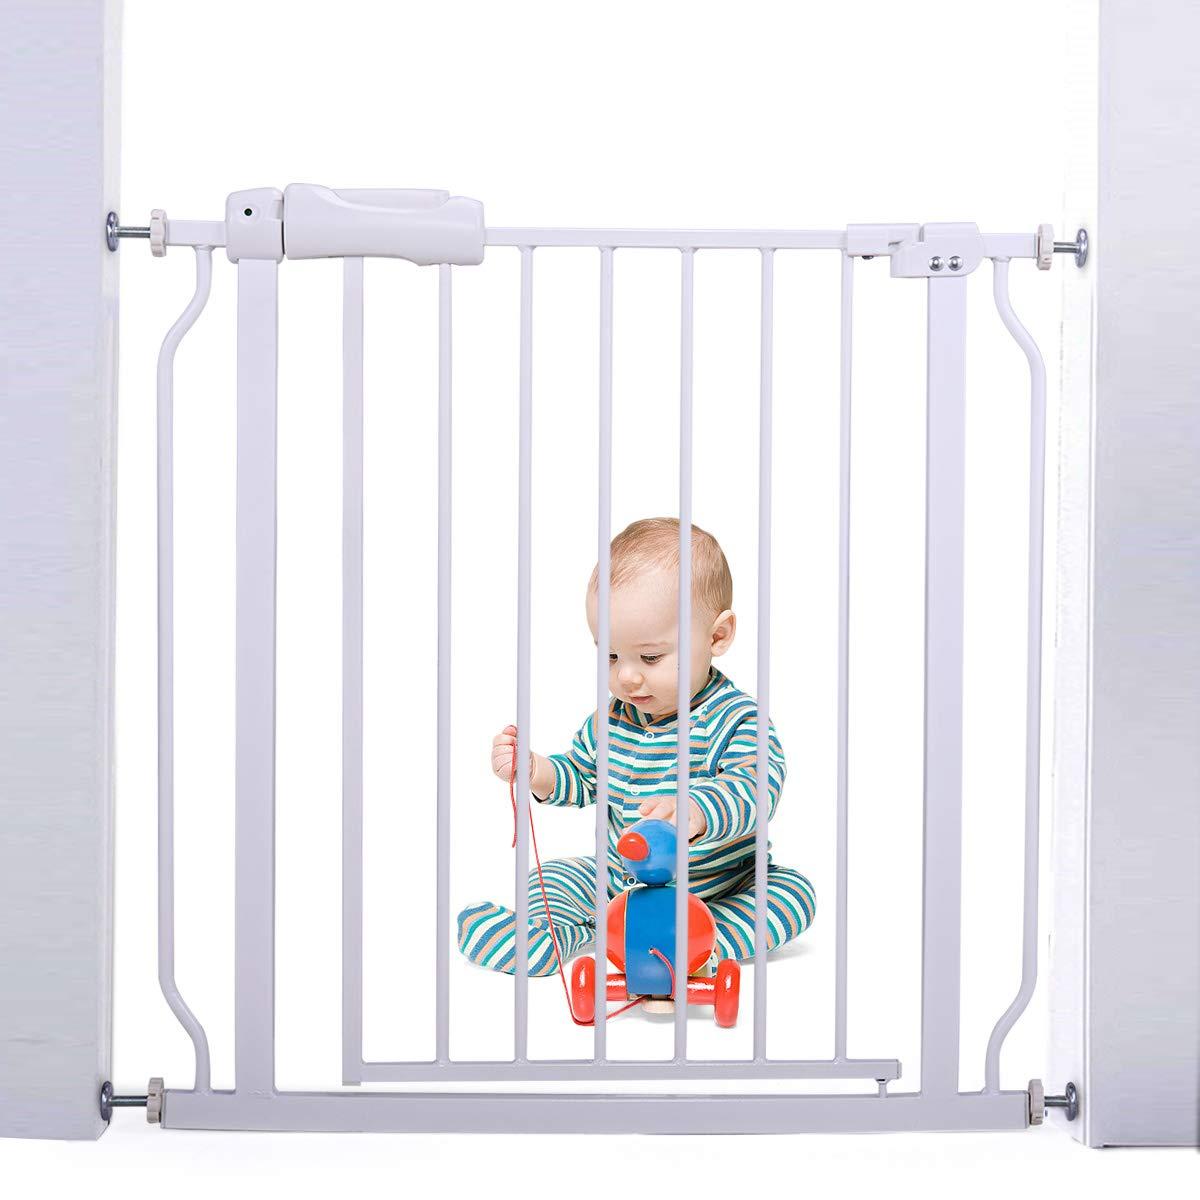 JAXPETY Baby Safety Gate Door Walk Through Toddler Child Pet Metal Easy Locking System